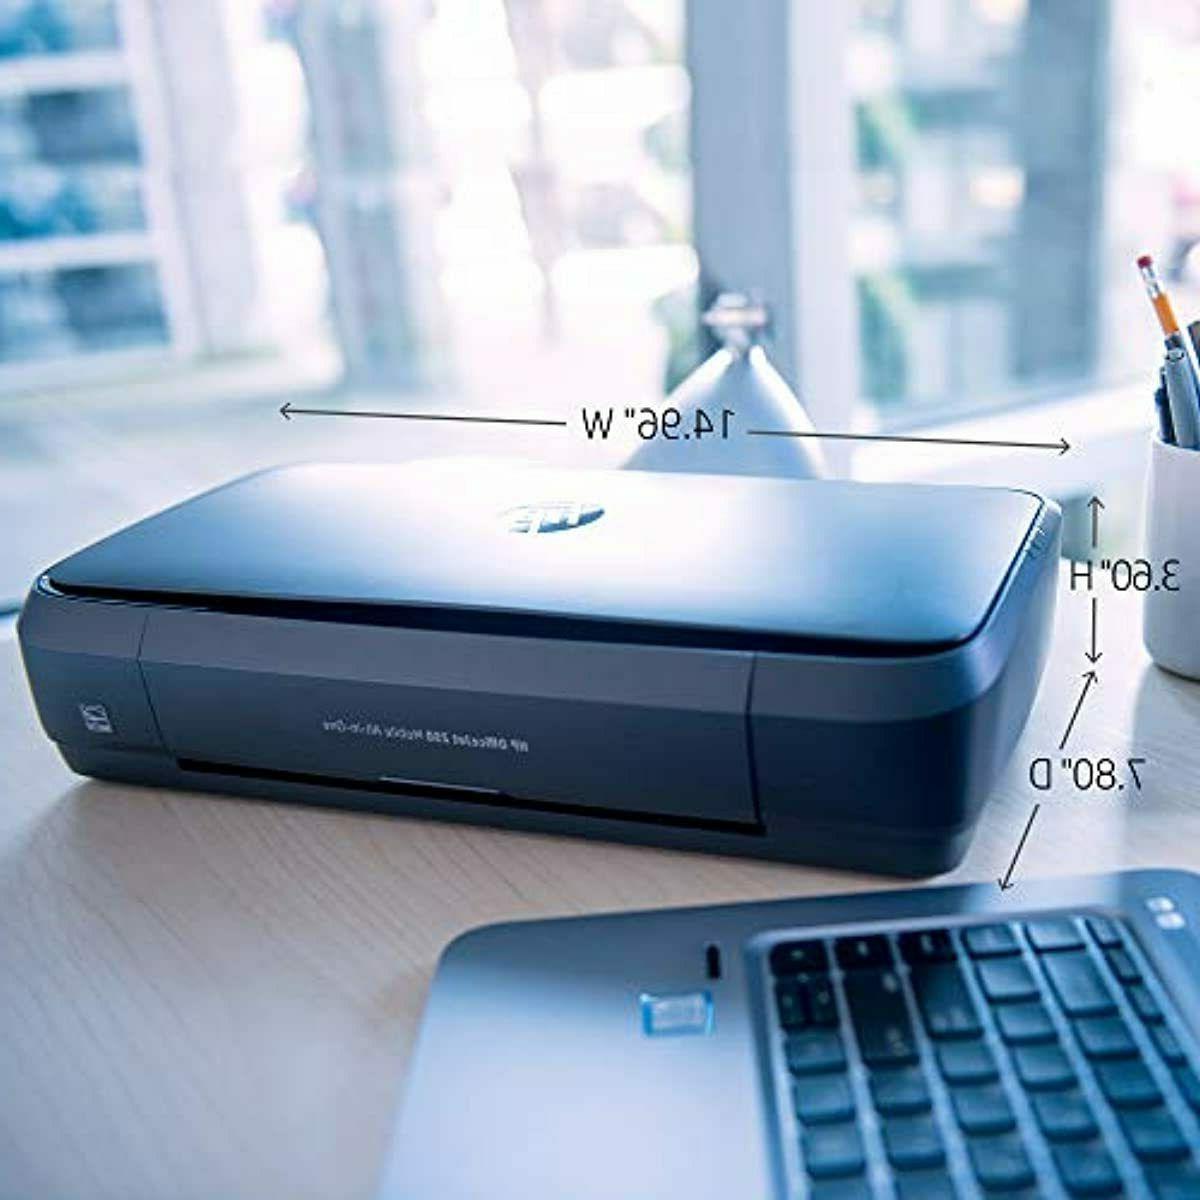 HP OfficeJet Portable Printer & Printing (CZ